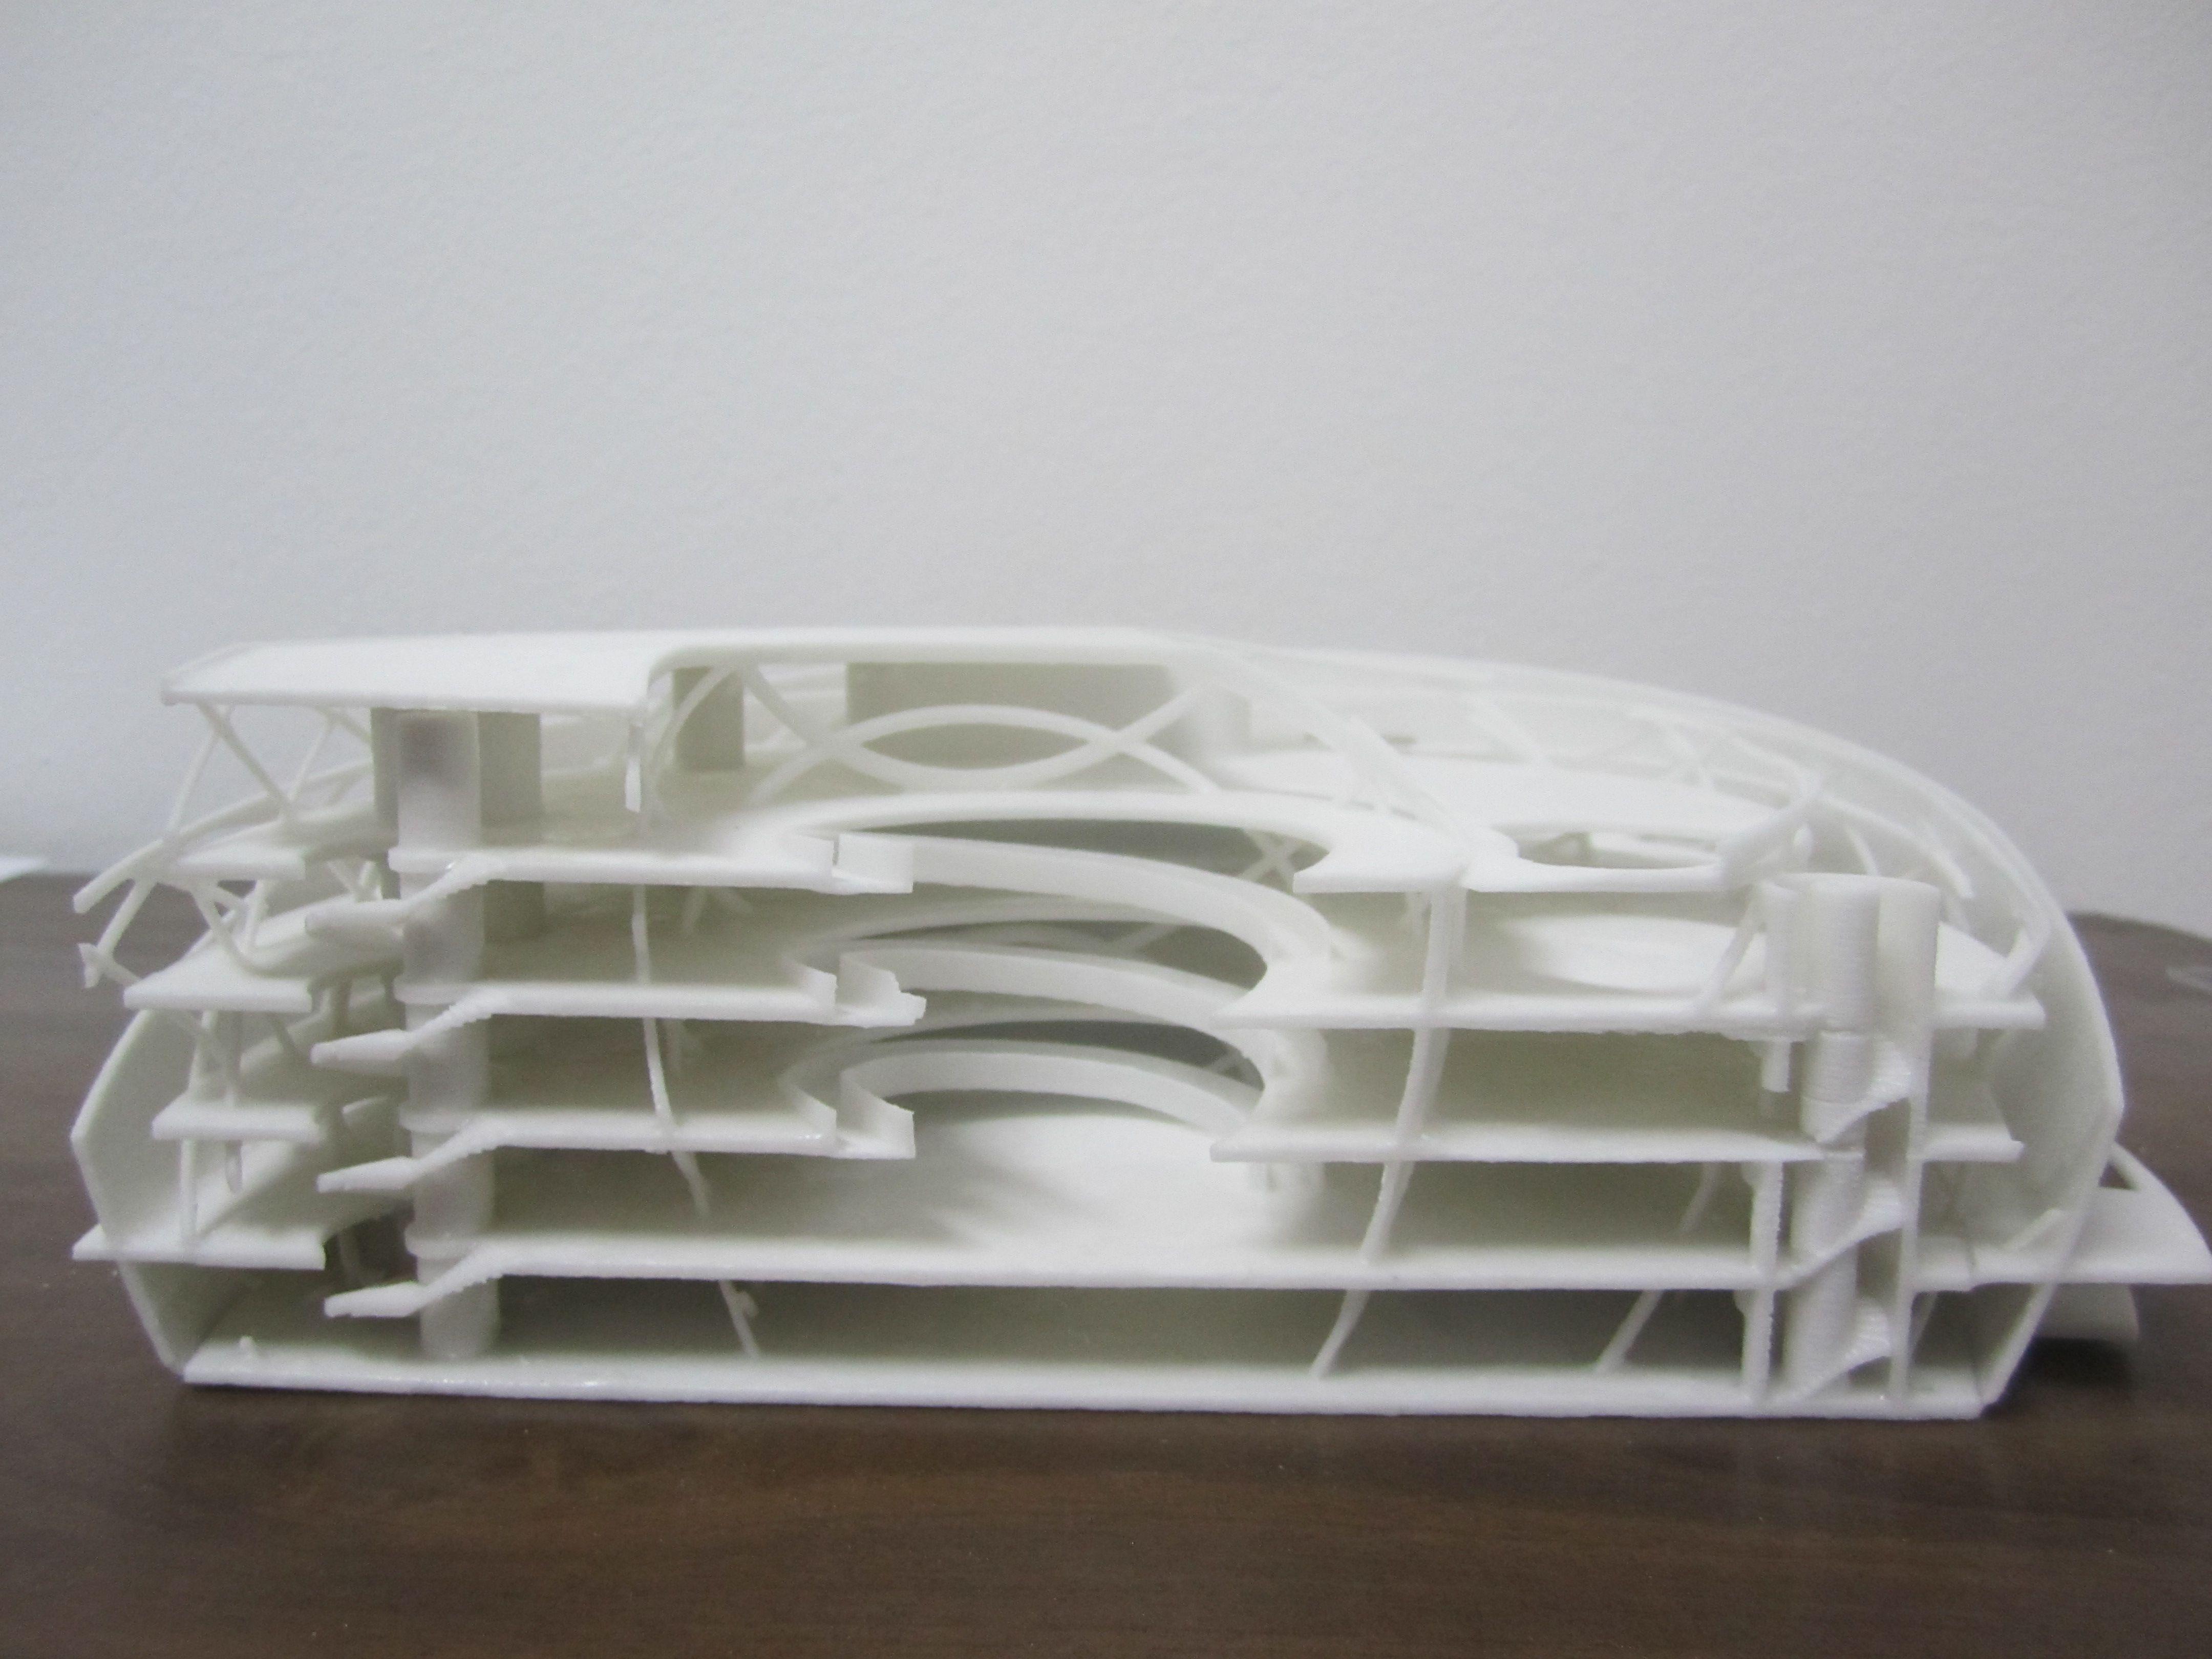 Impresi n 3d maqueta de corte de hospital maqueta para Impresion 3d construccion